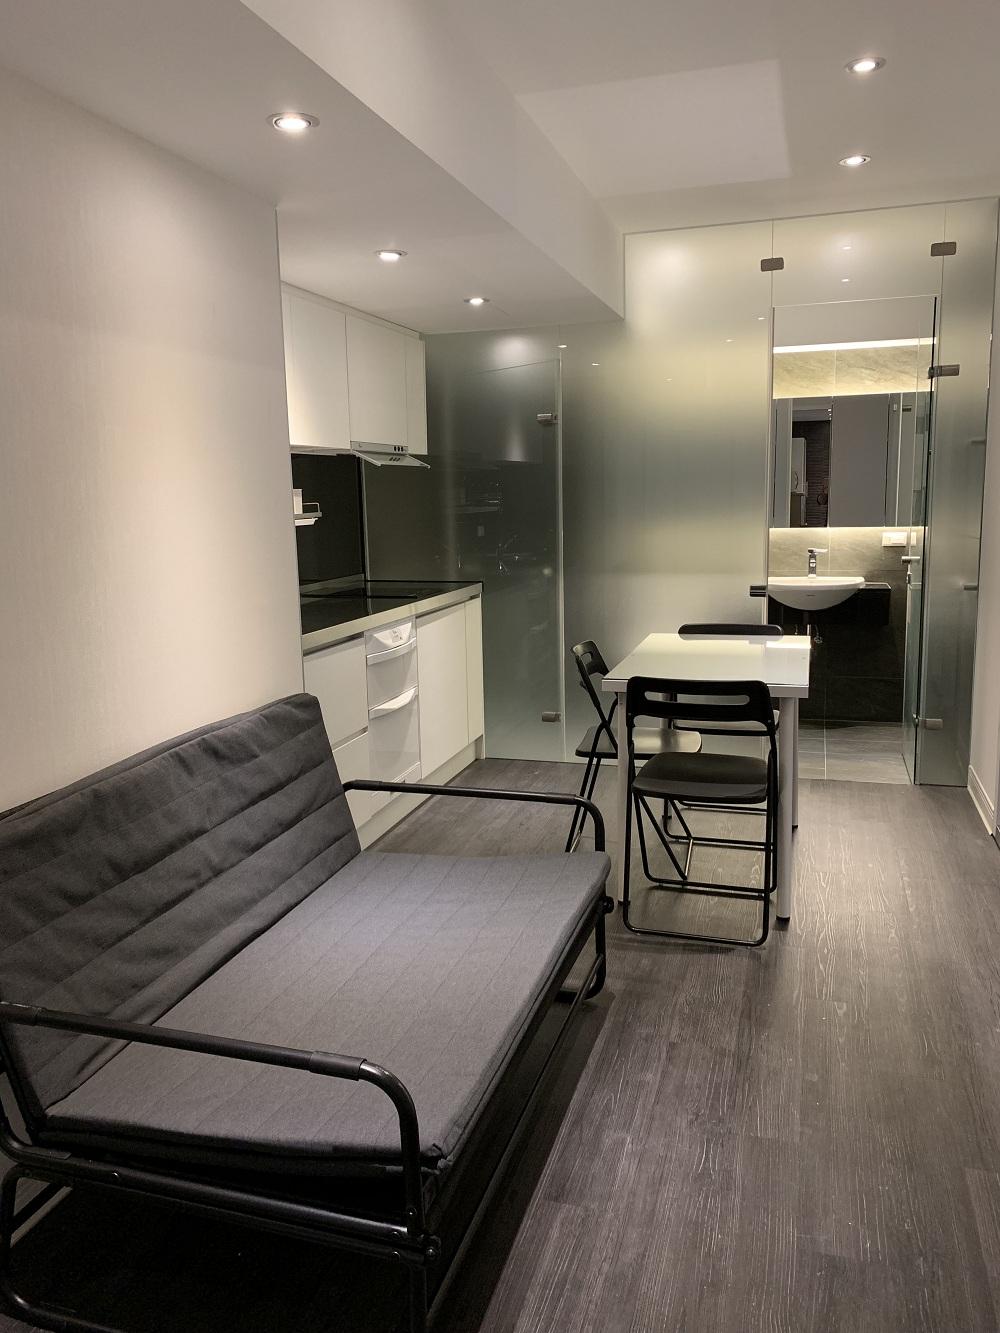 Teaching English and Living in Taiwan Apartments to Share, Elegantly Designed Rooms near MRT, NTNU, NTU, NTUST, NTUE, PCCU, NCCU image